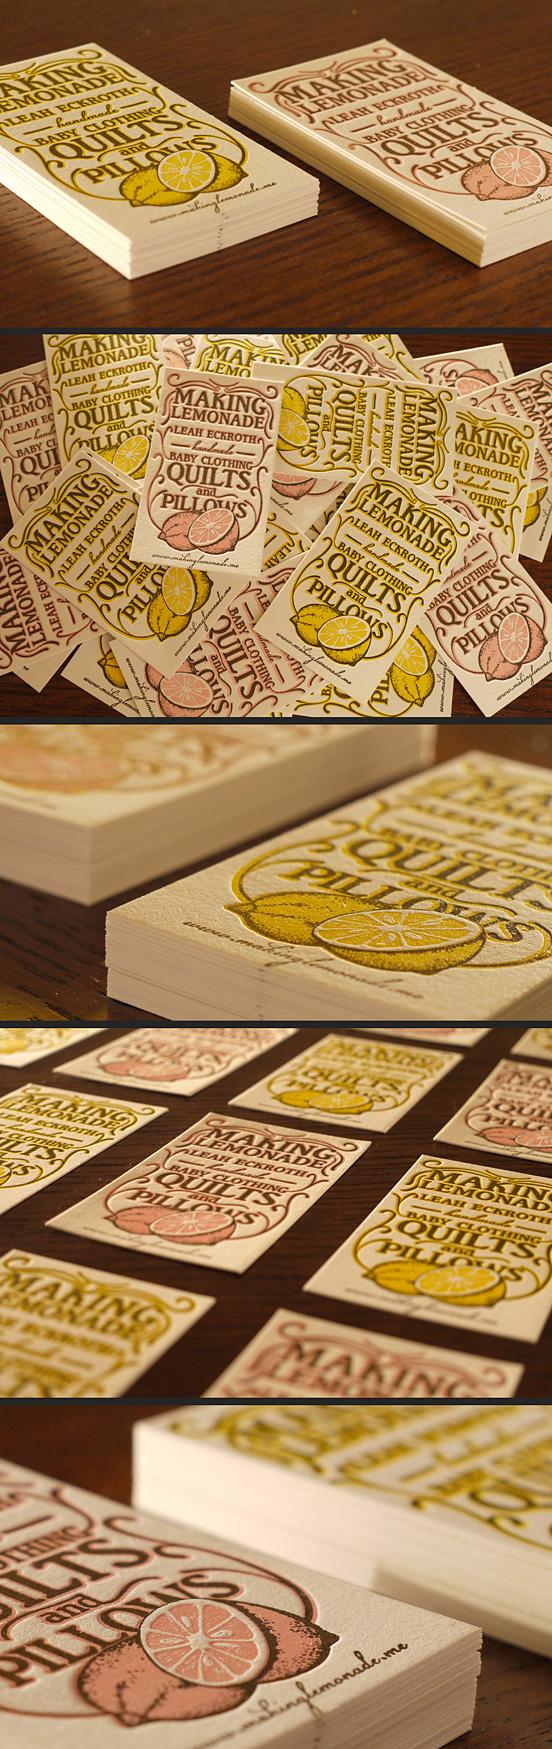 Lemonade Business Cards by Print&Grain